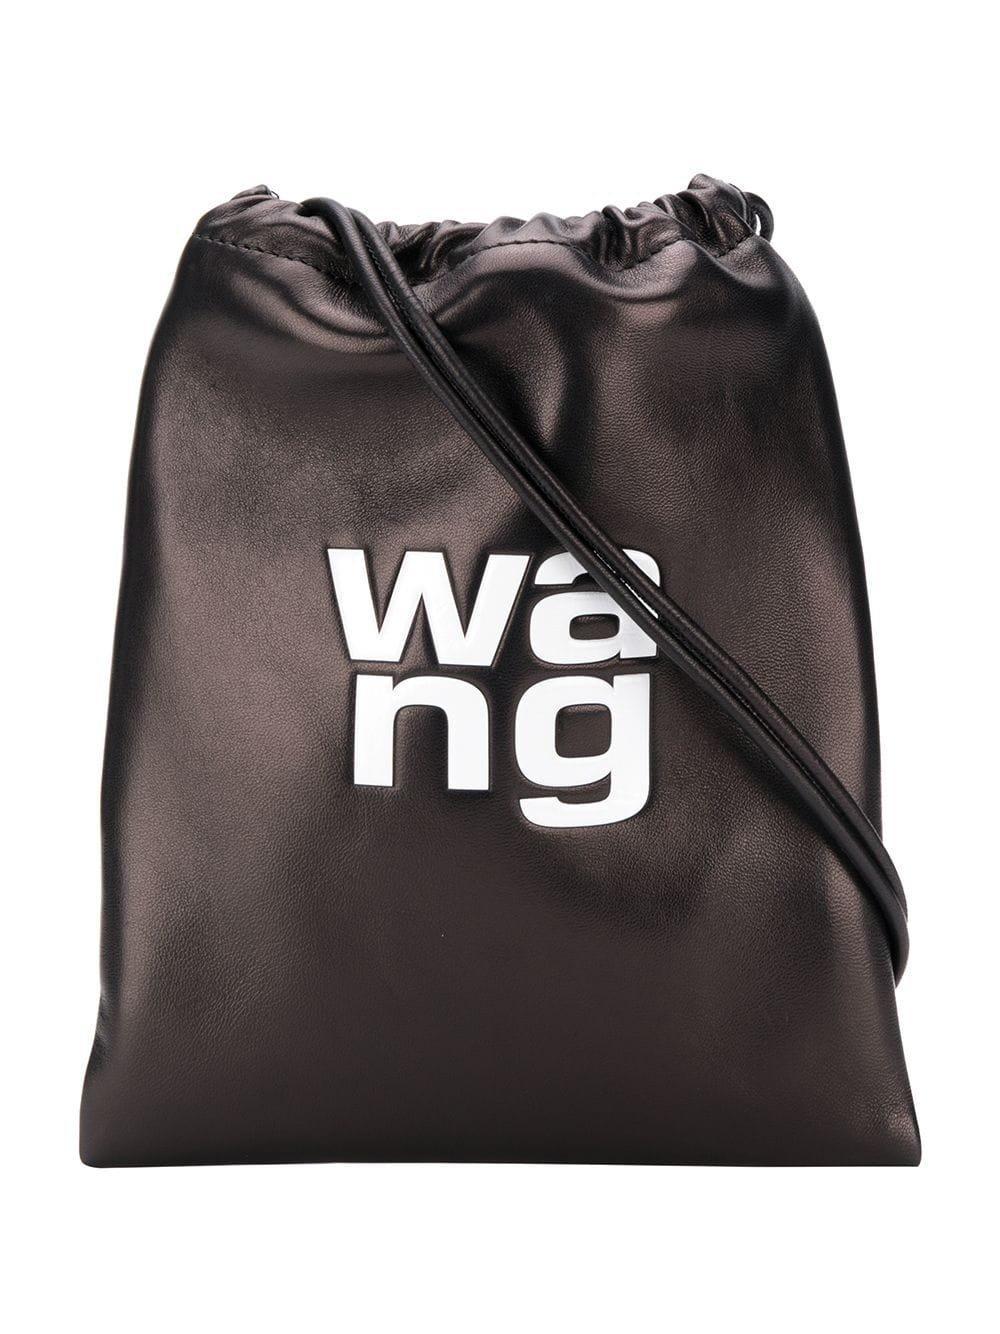 Women S Black Leather Embossed Logo Drawstring Bag By